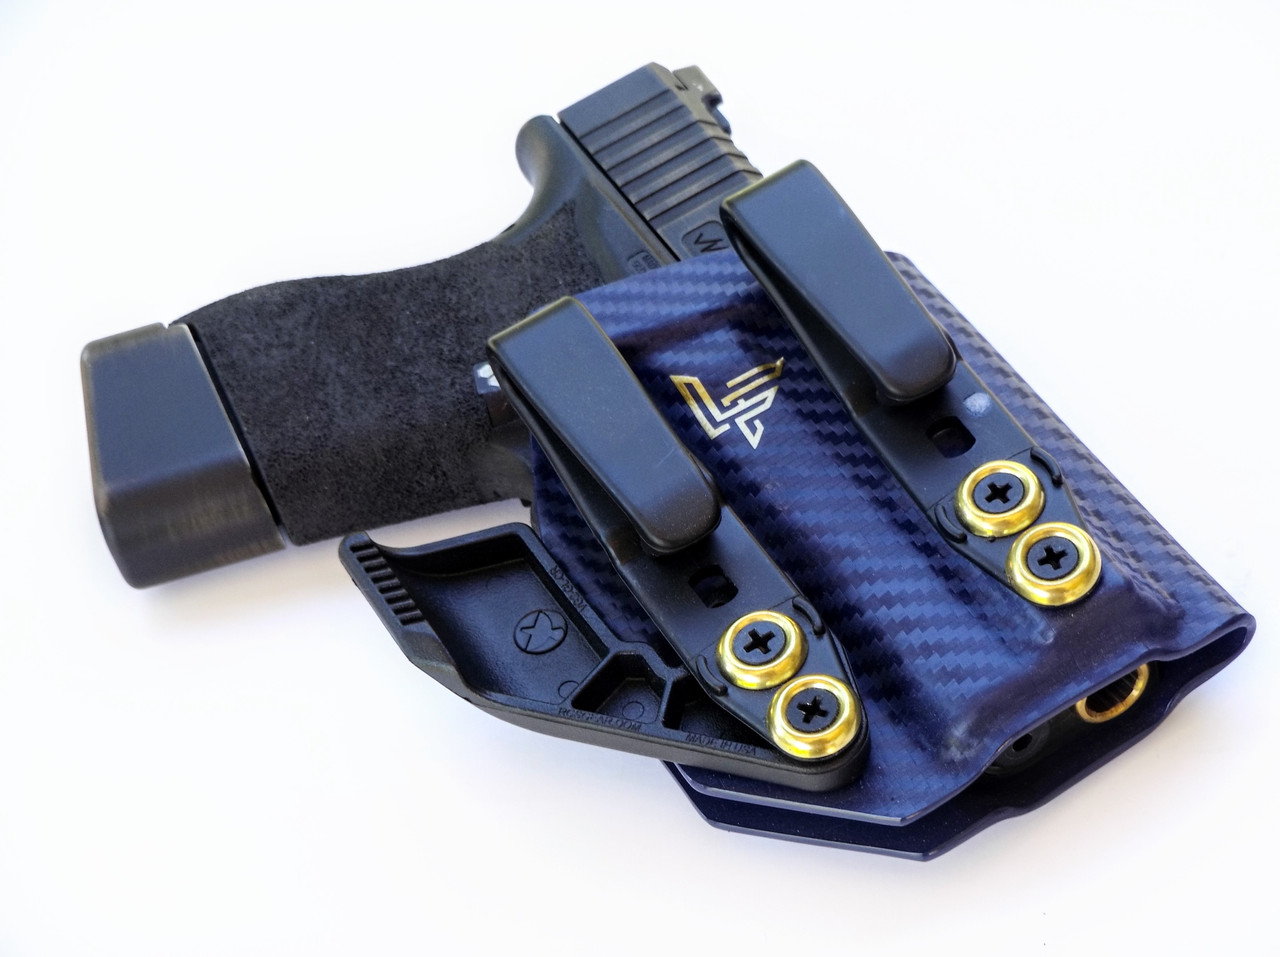 Glock 43 Carbon Fiber Holster